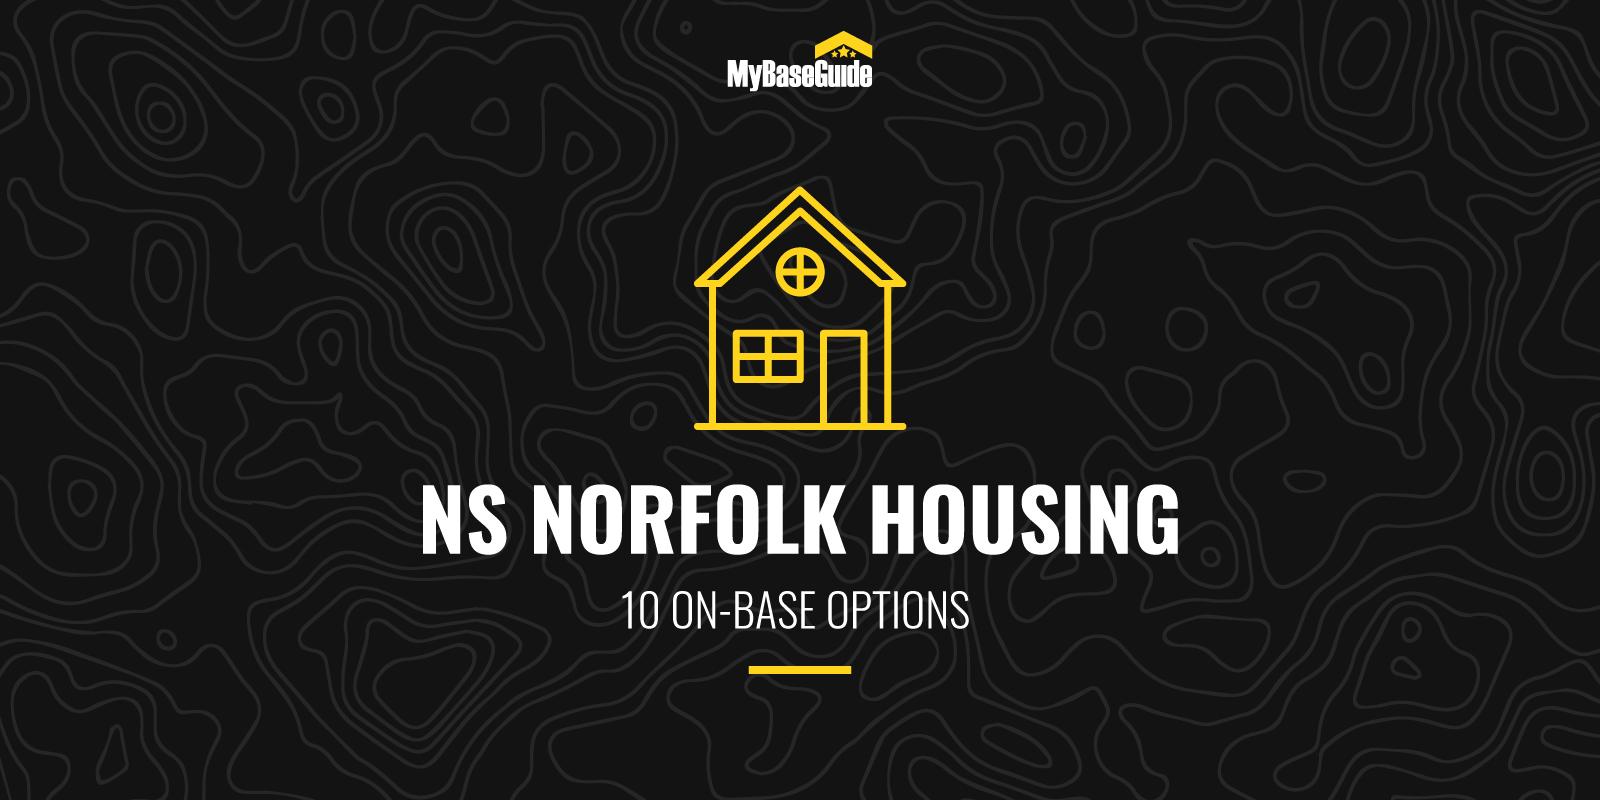 NS Norfolk Housing: 10 On-Base Options